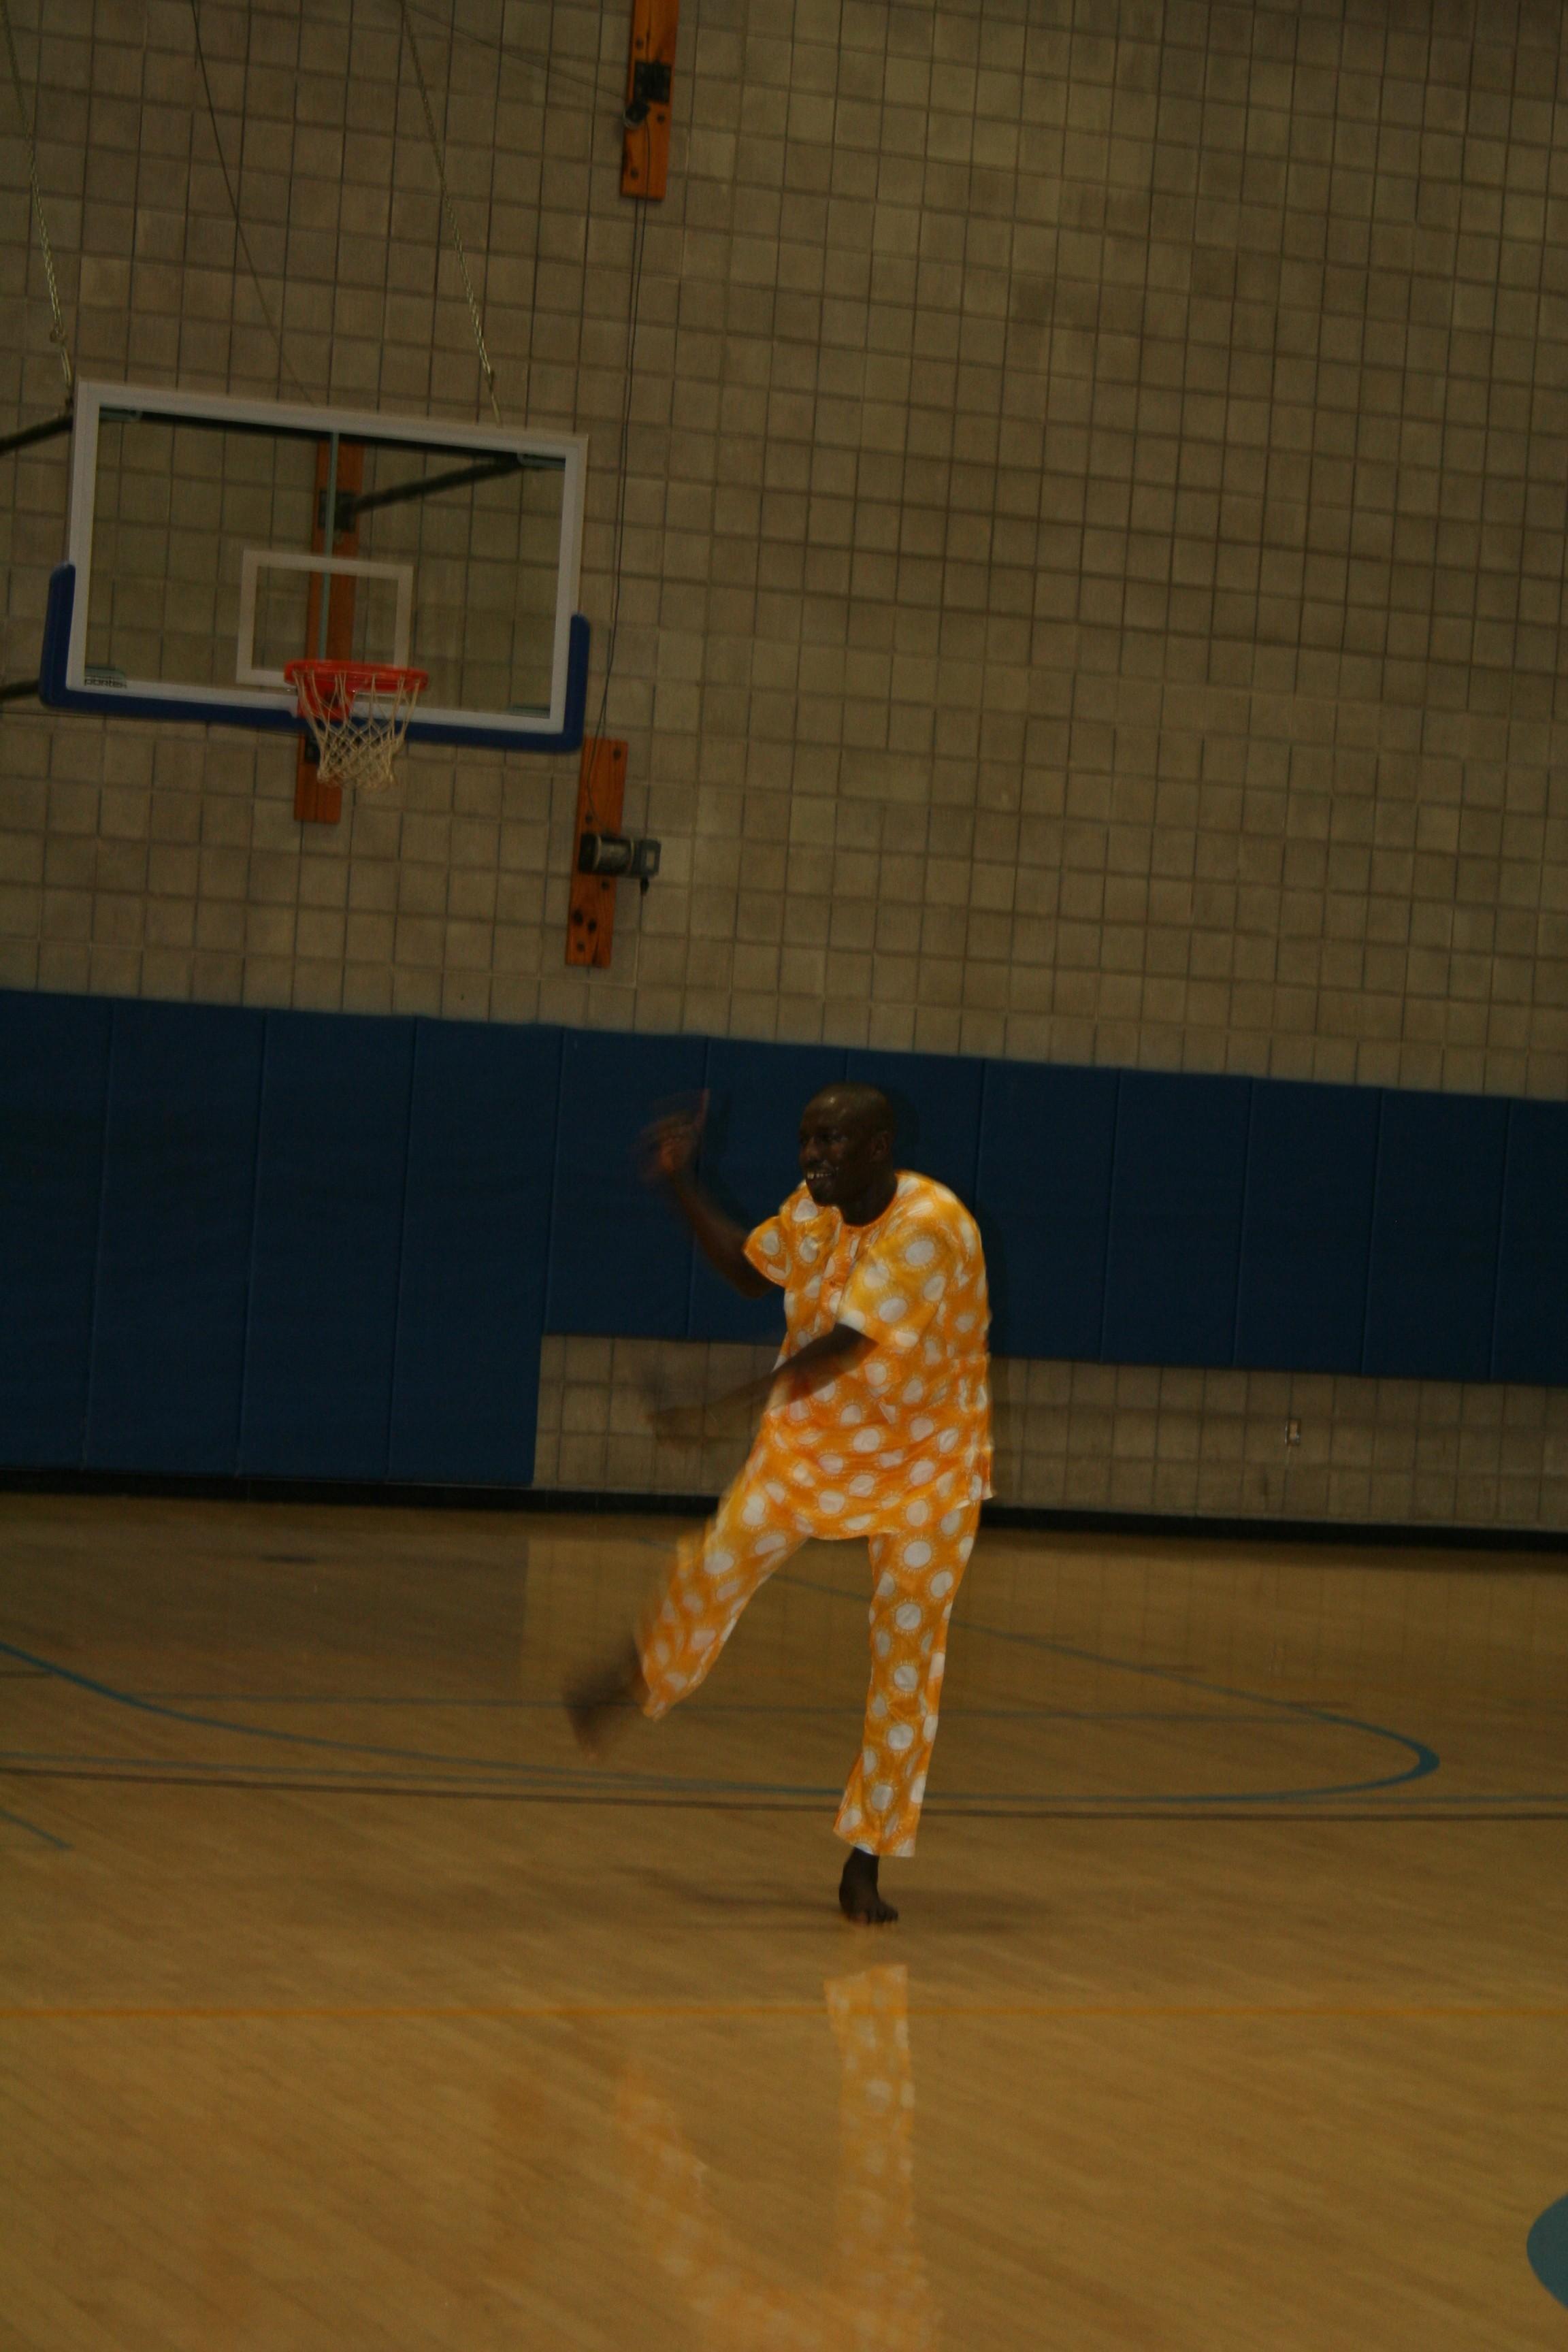 Aziz Faye demonstrates some dance moves.